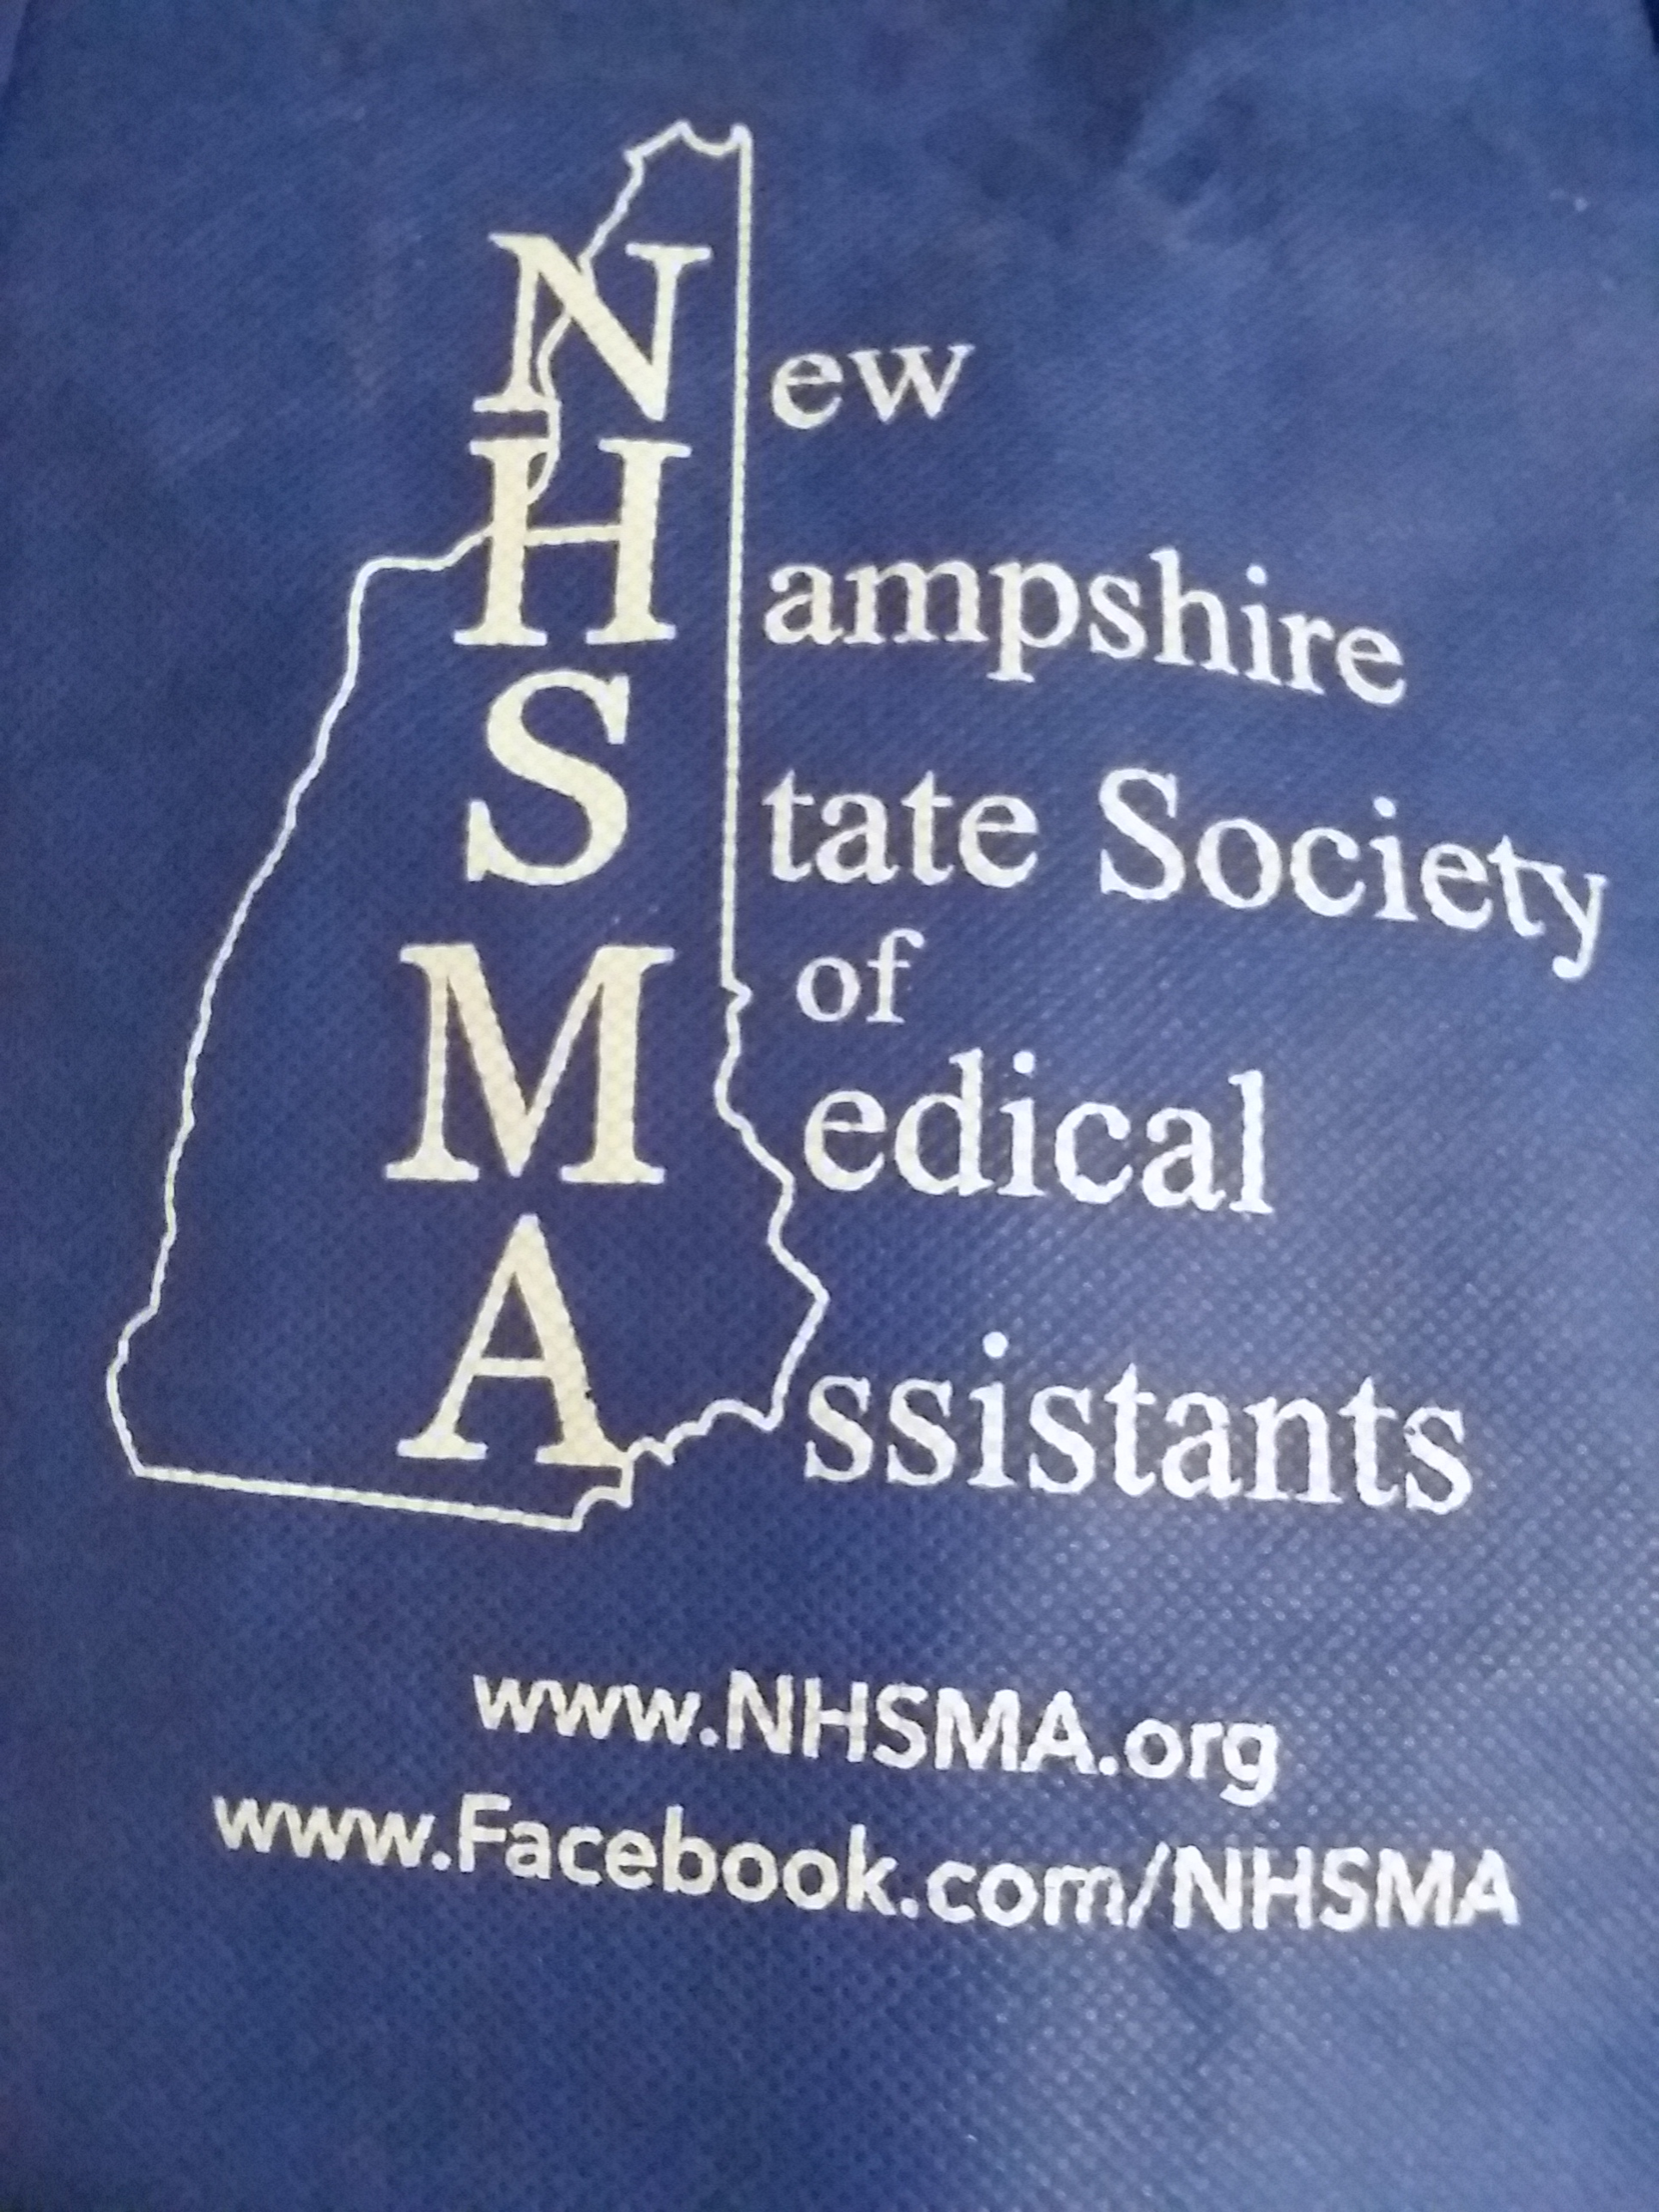 NHSMA Logo